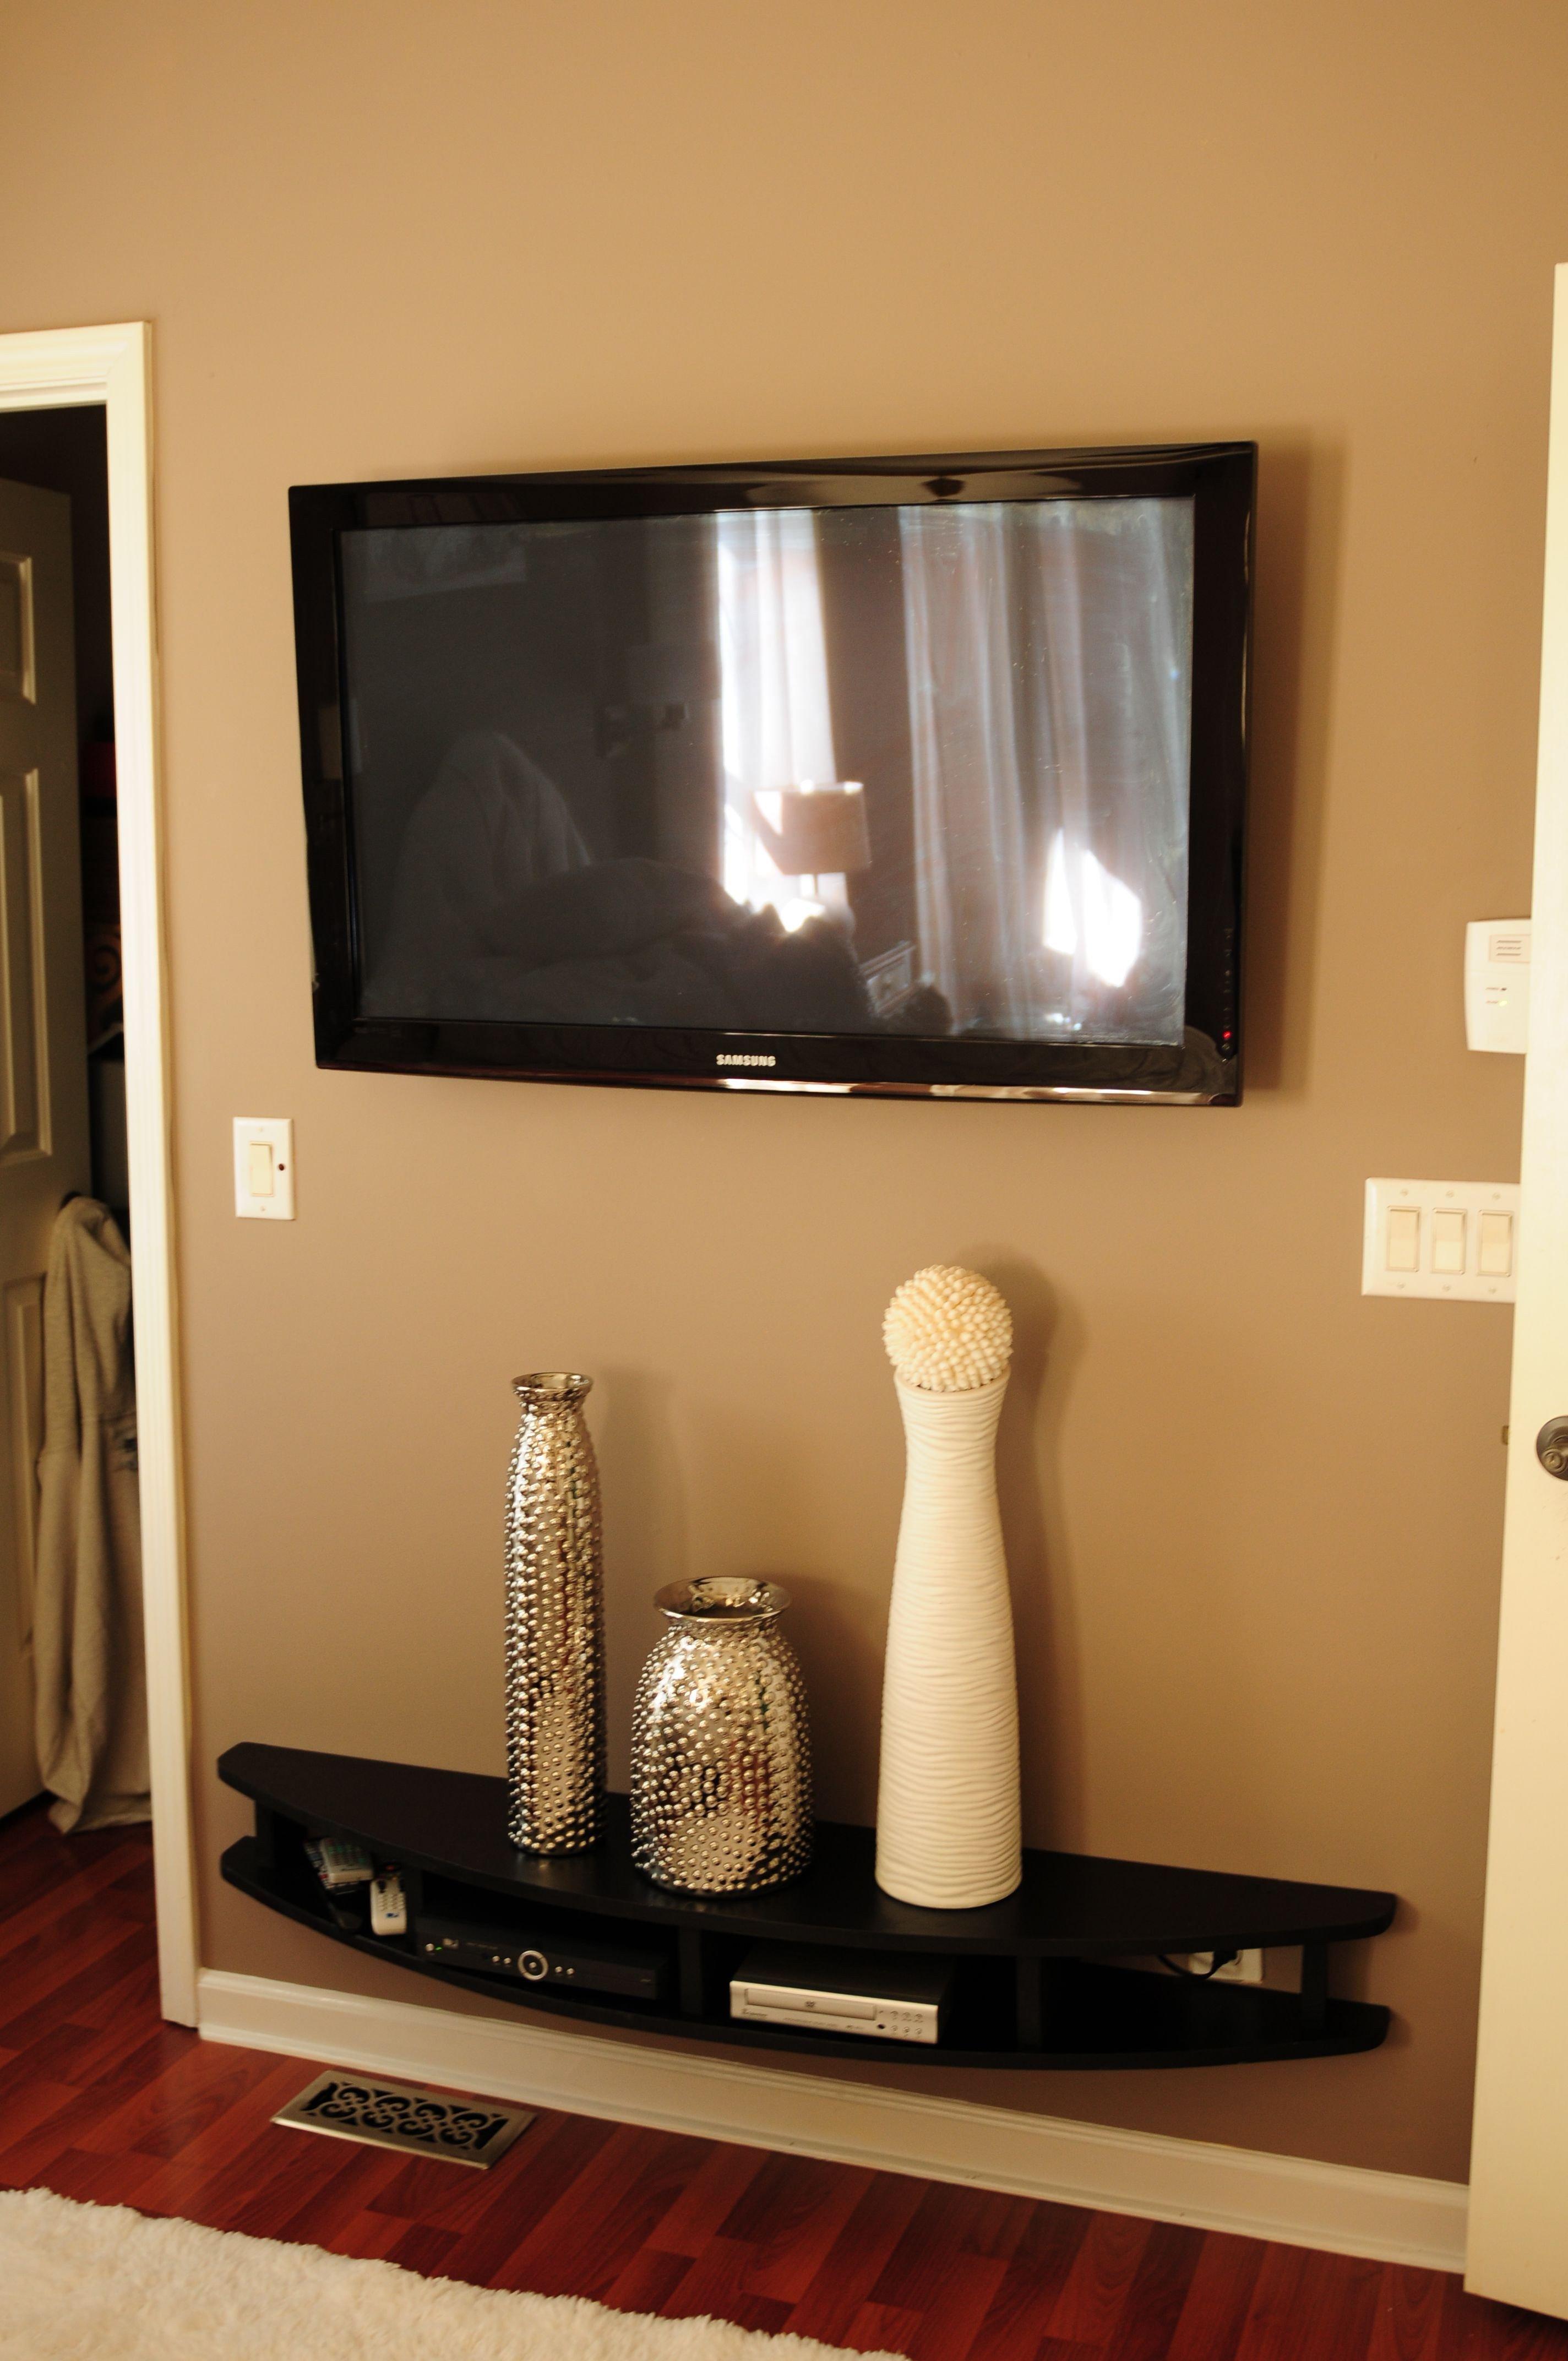 Tv Height In Bedroom Best Of 9 Best Tv Wall Mount Ideas for Living Room